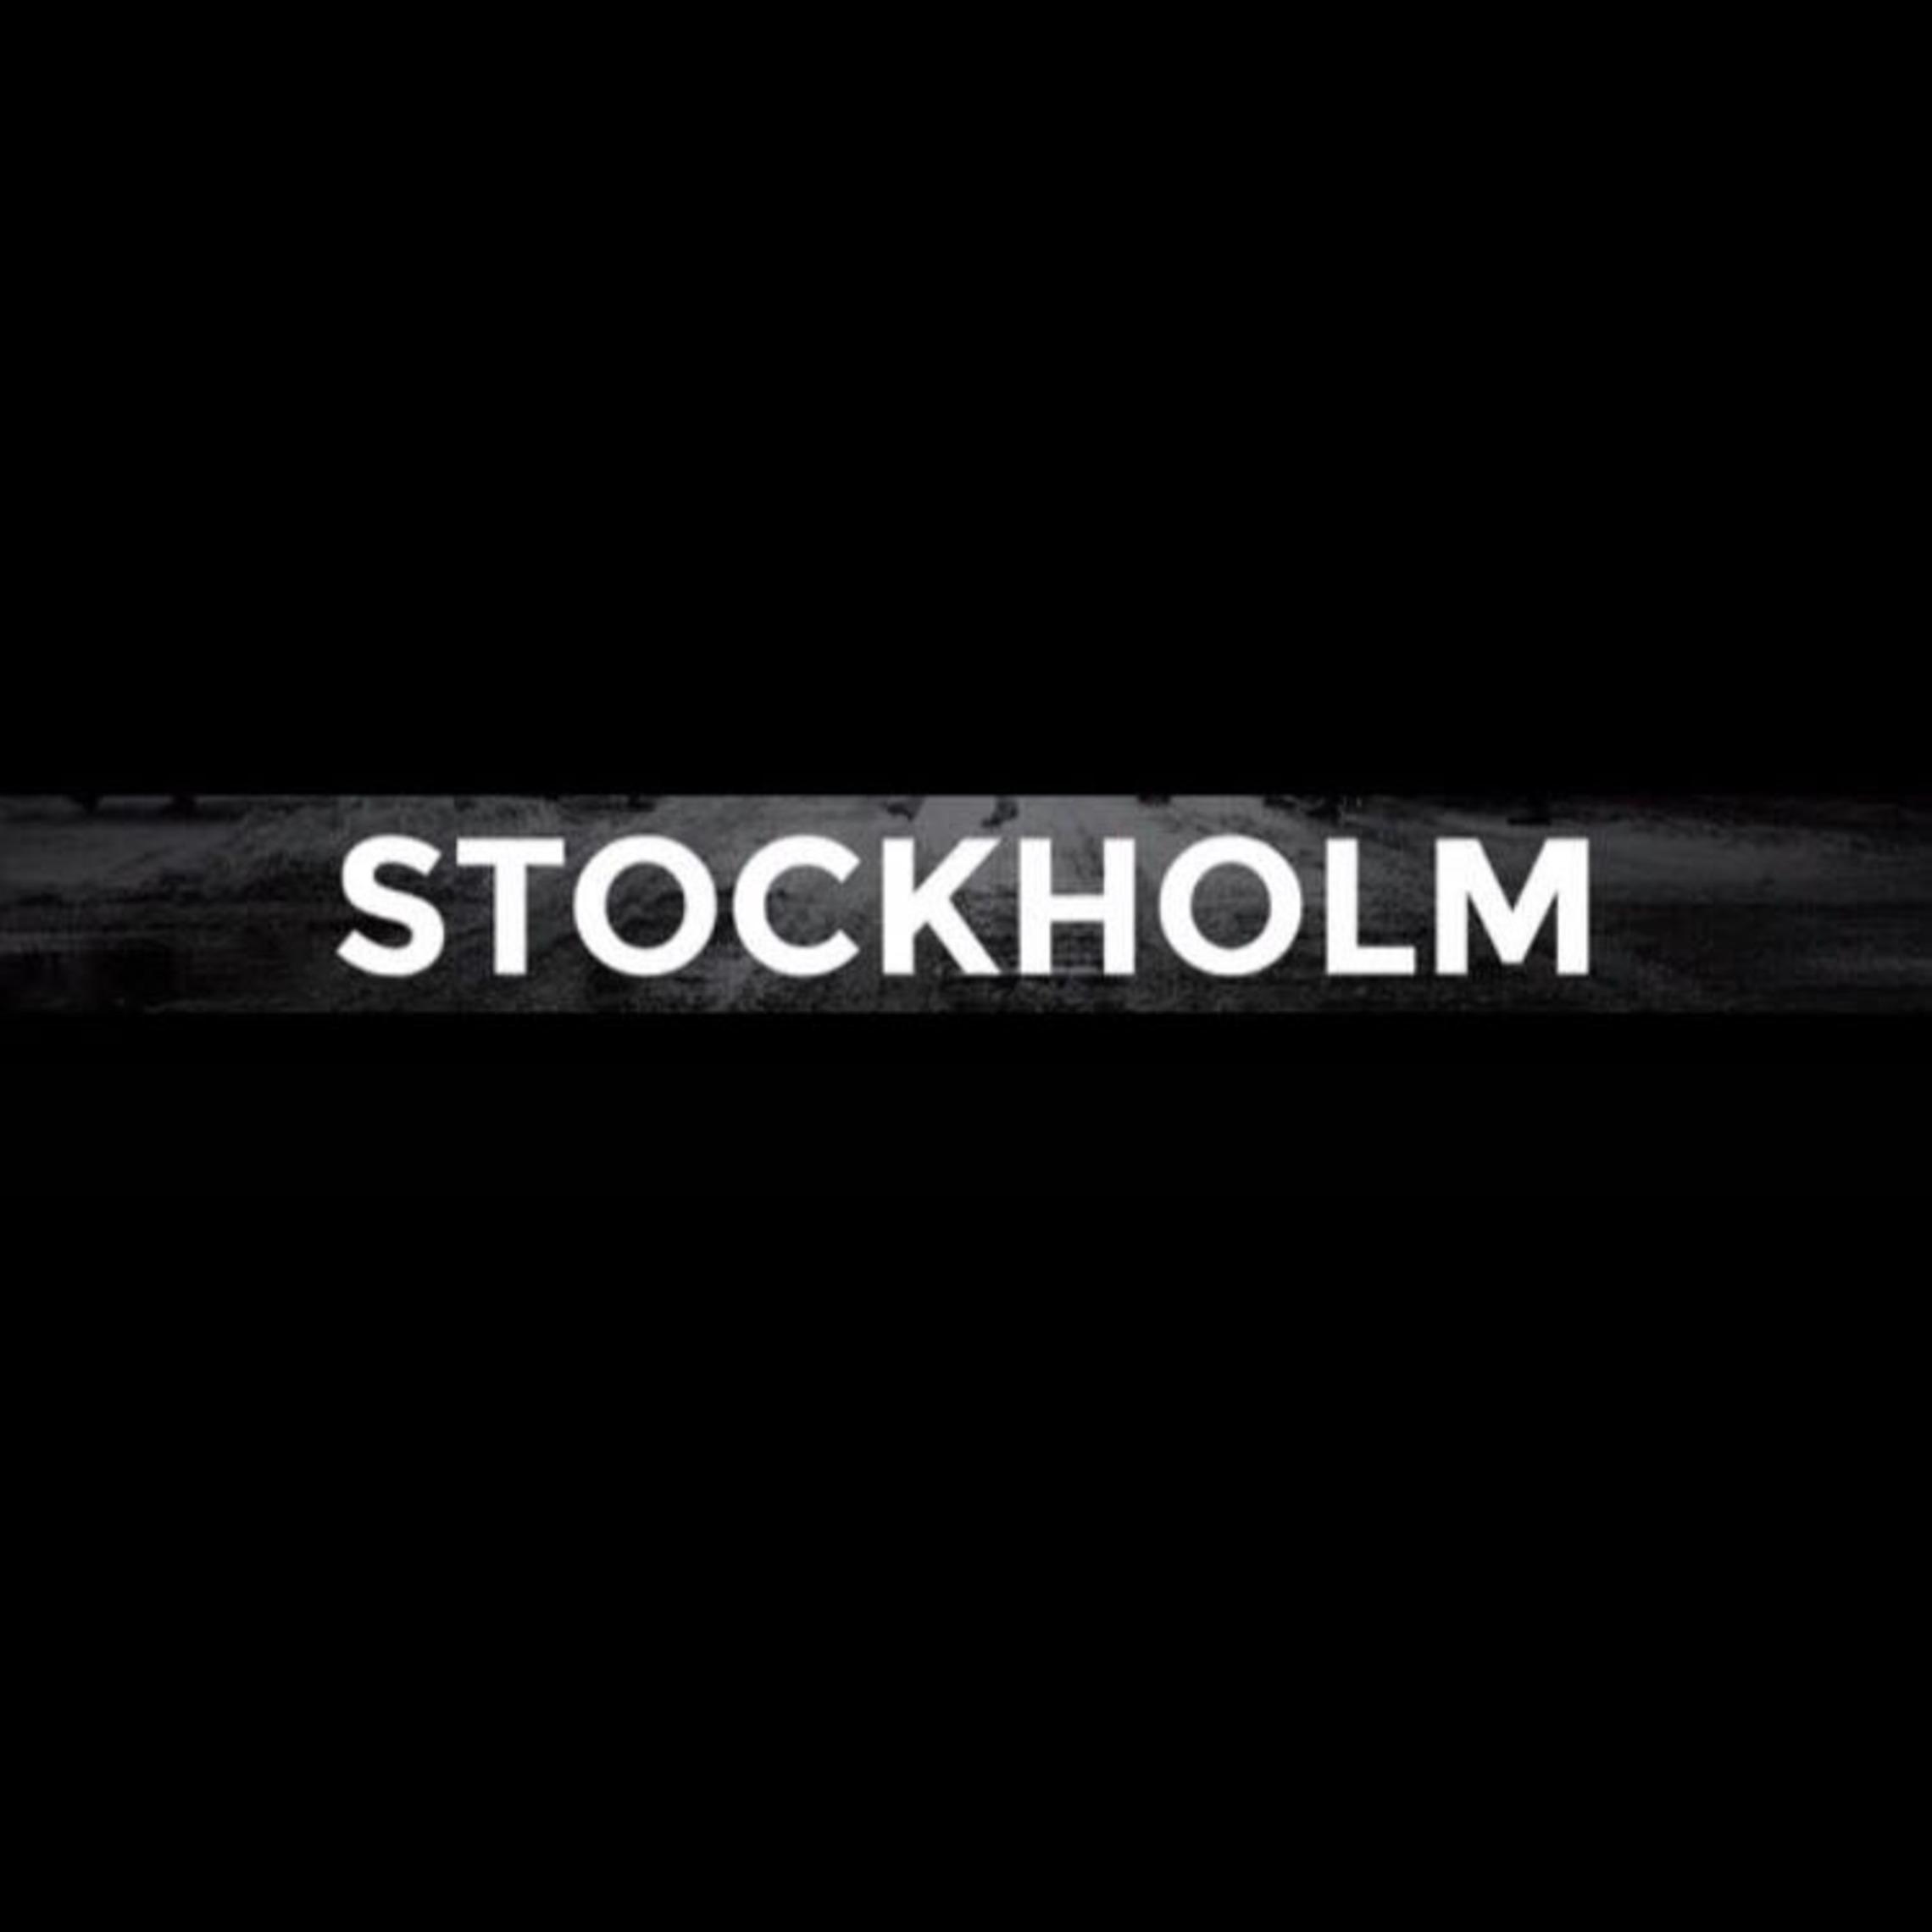 stockholm- company logo